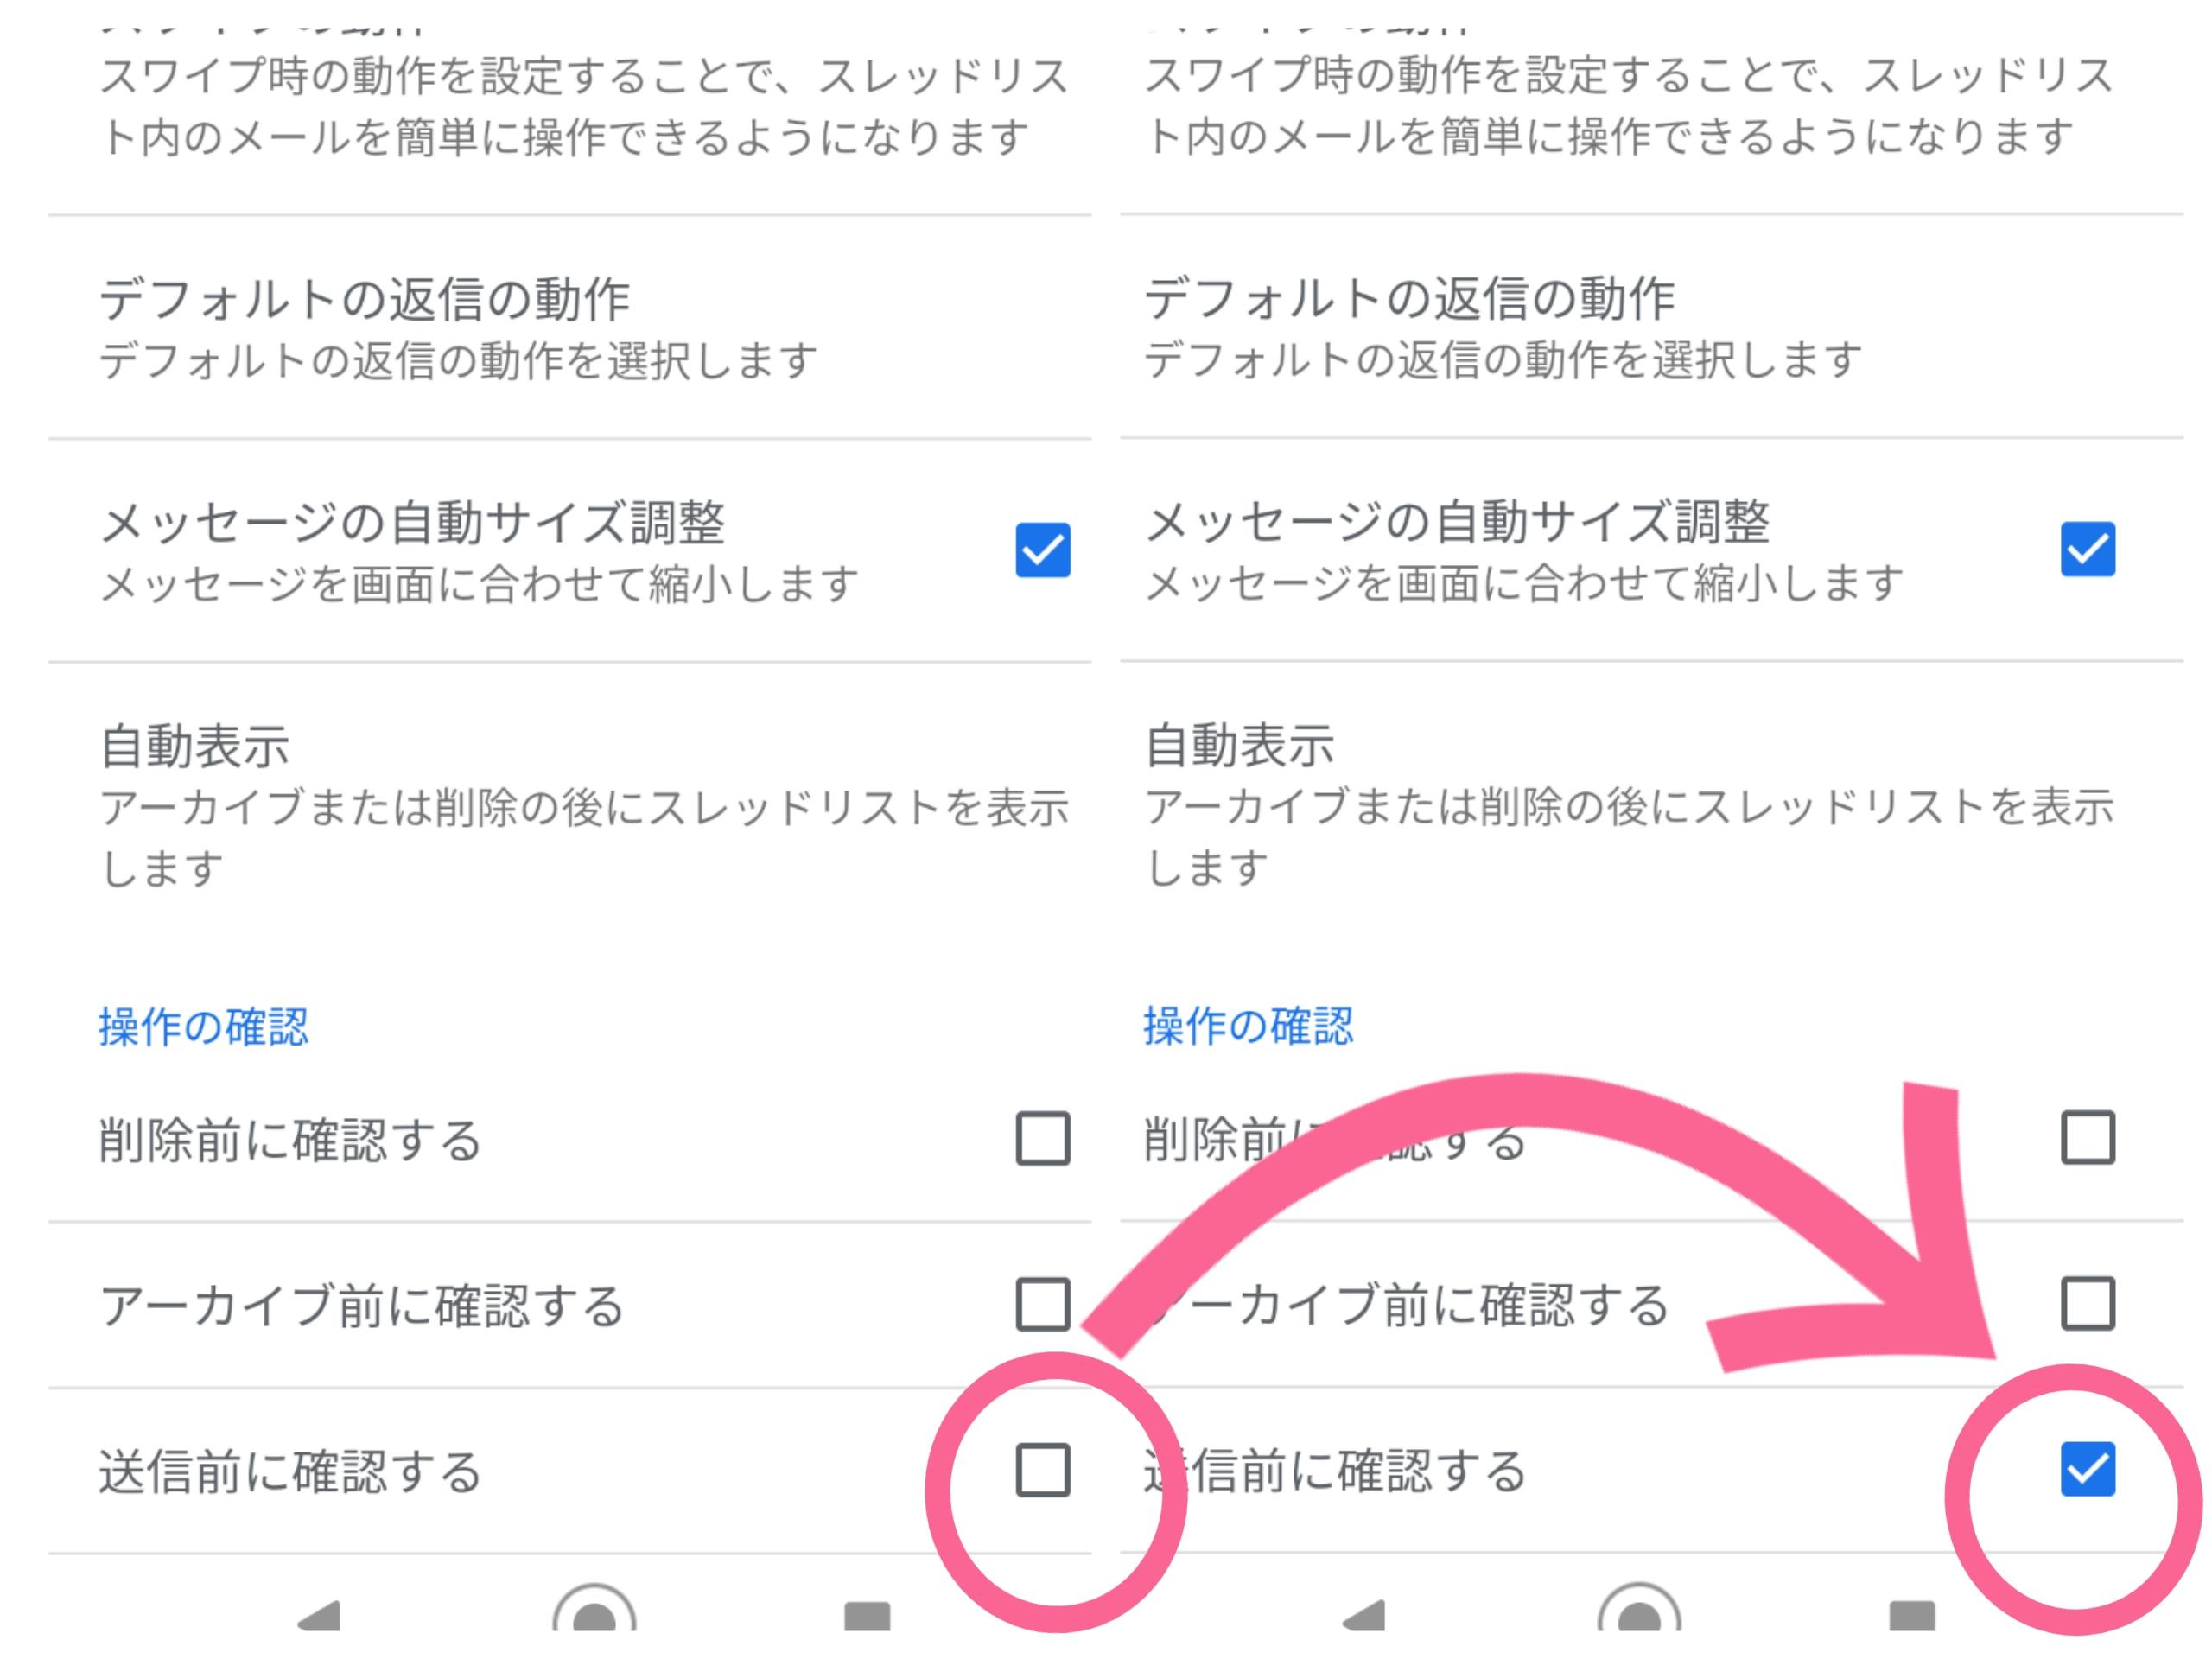 Gmail 全般設定 操作の確認 送信前に確認する チェック オン 完了